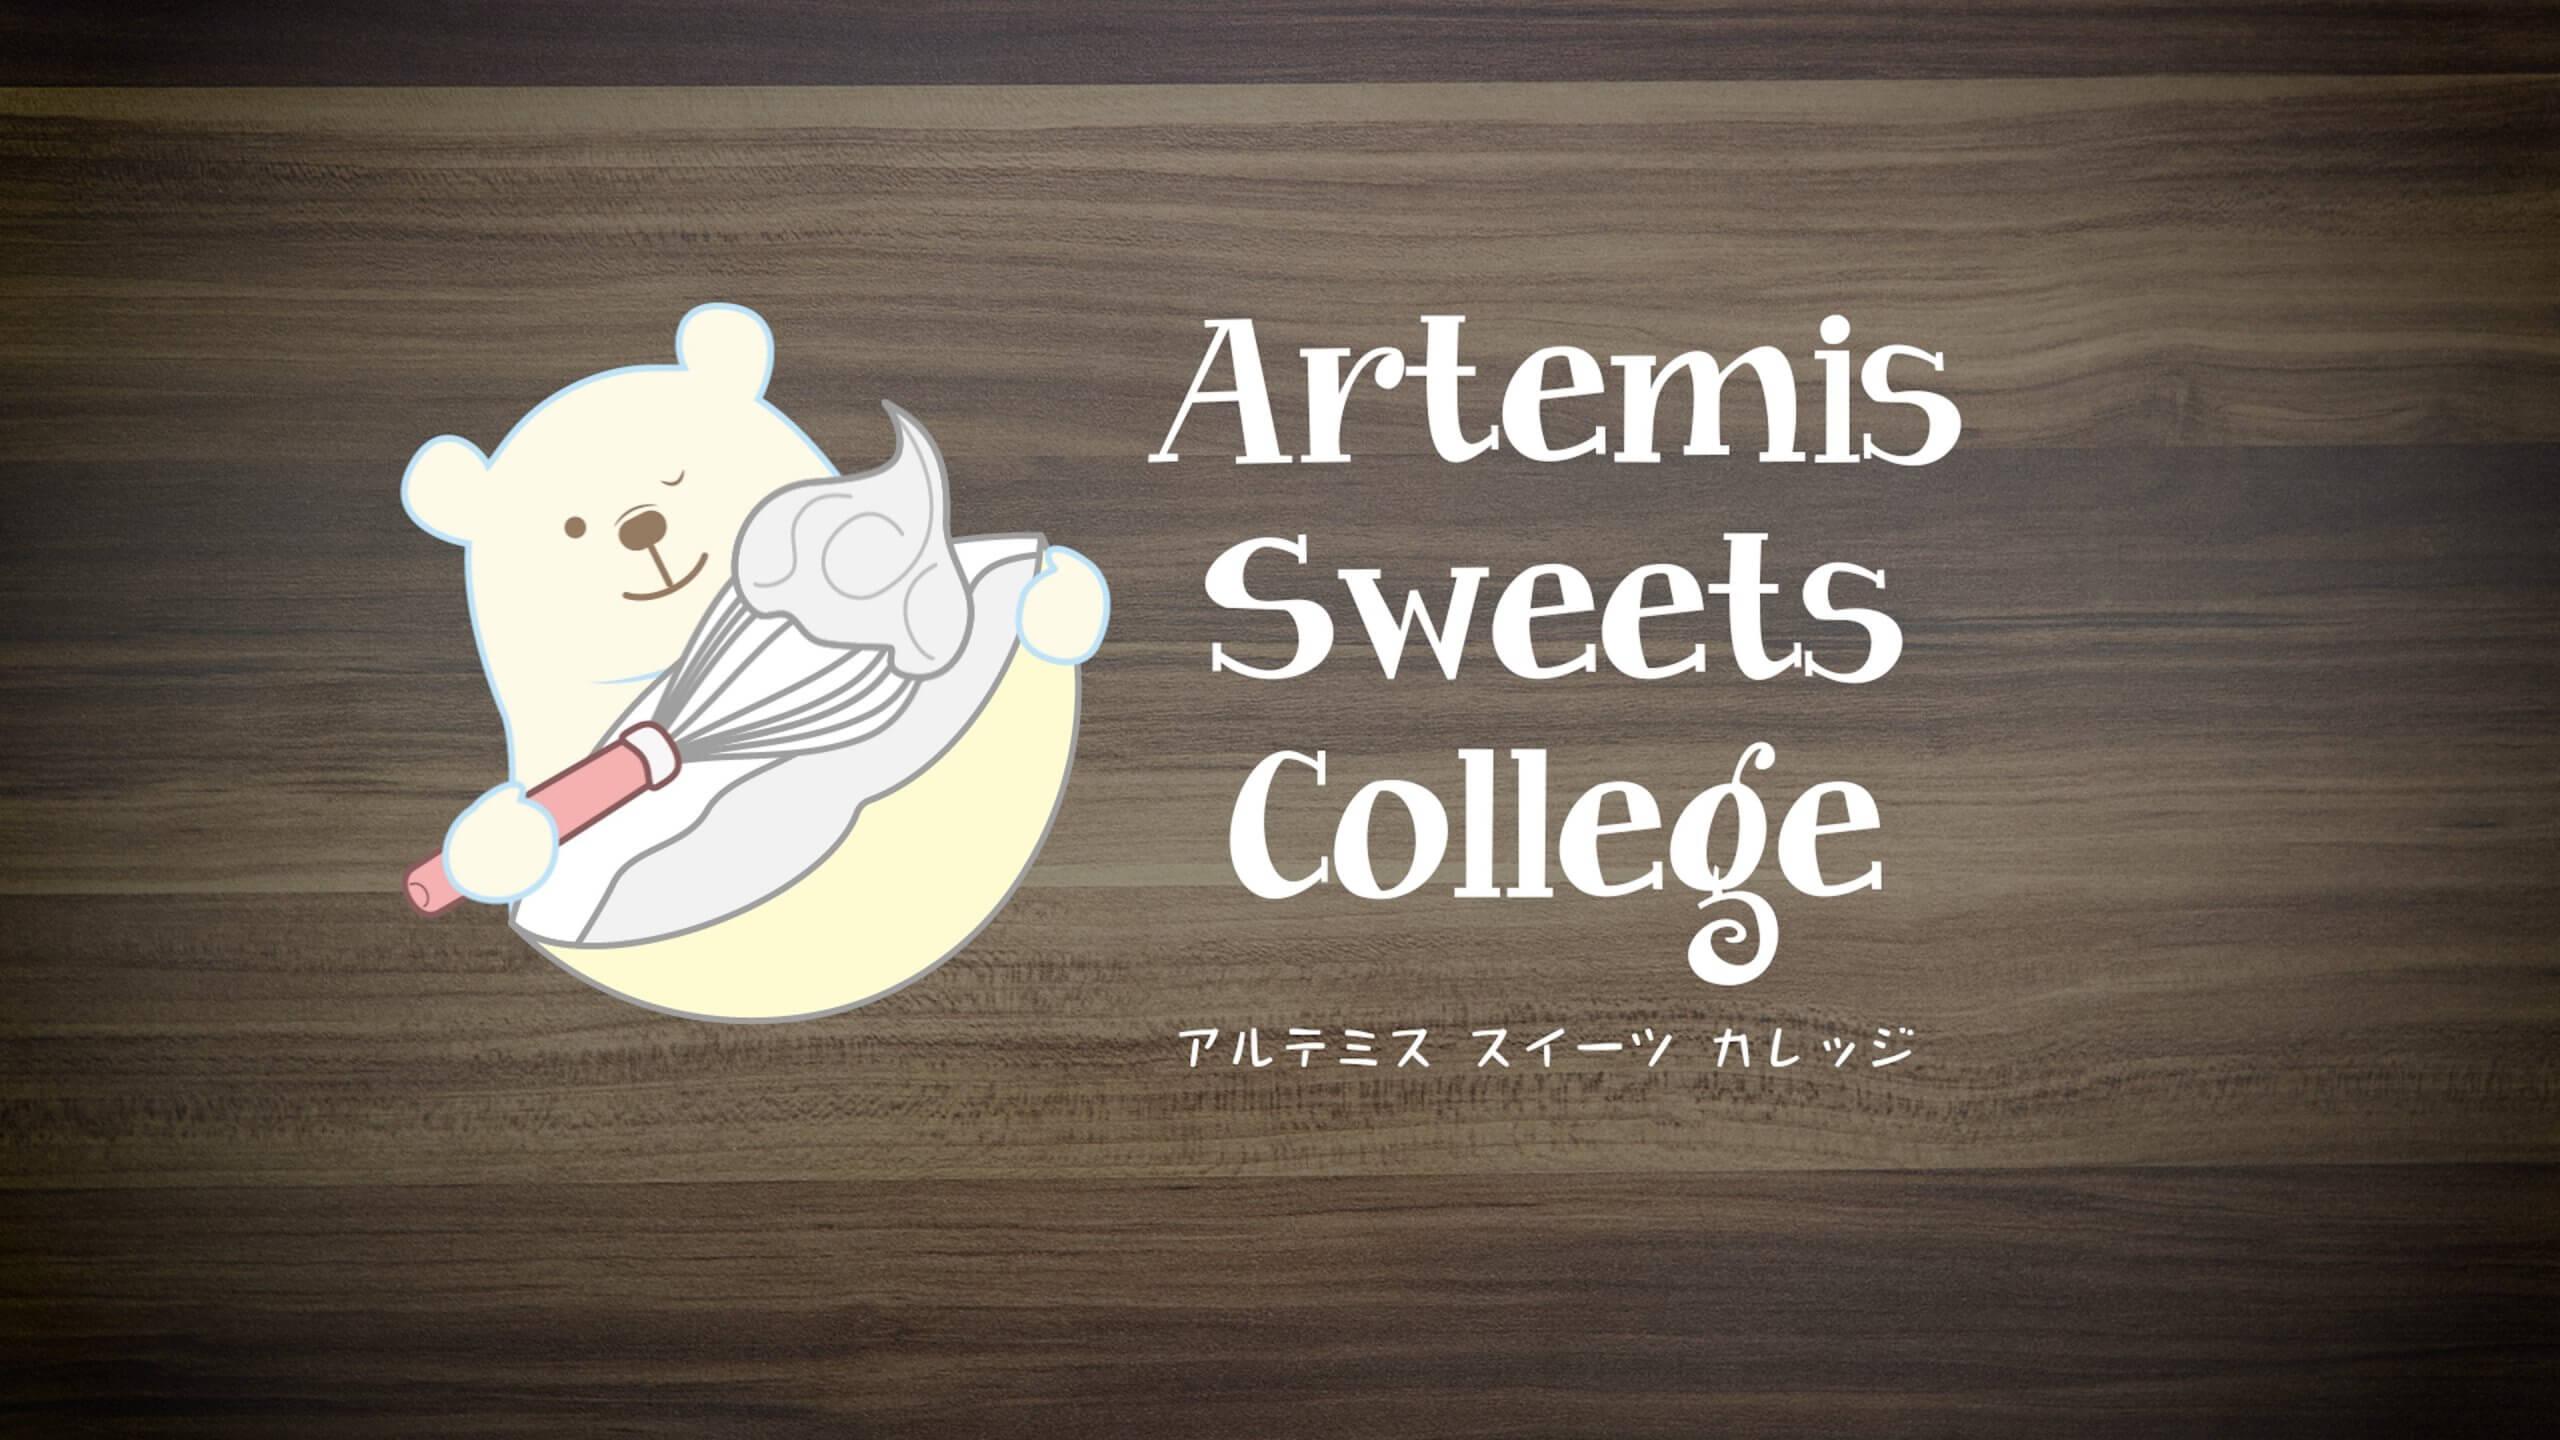 Artemis Sweets College